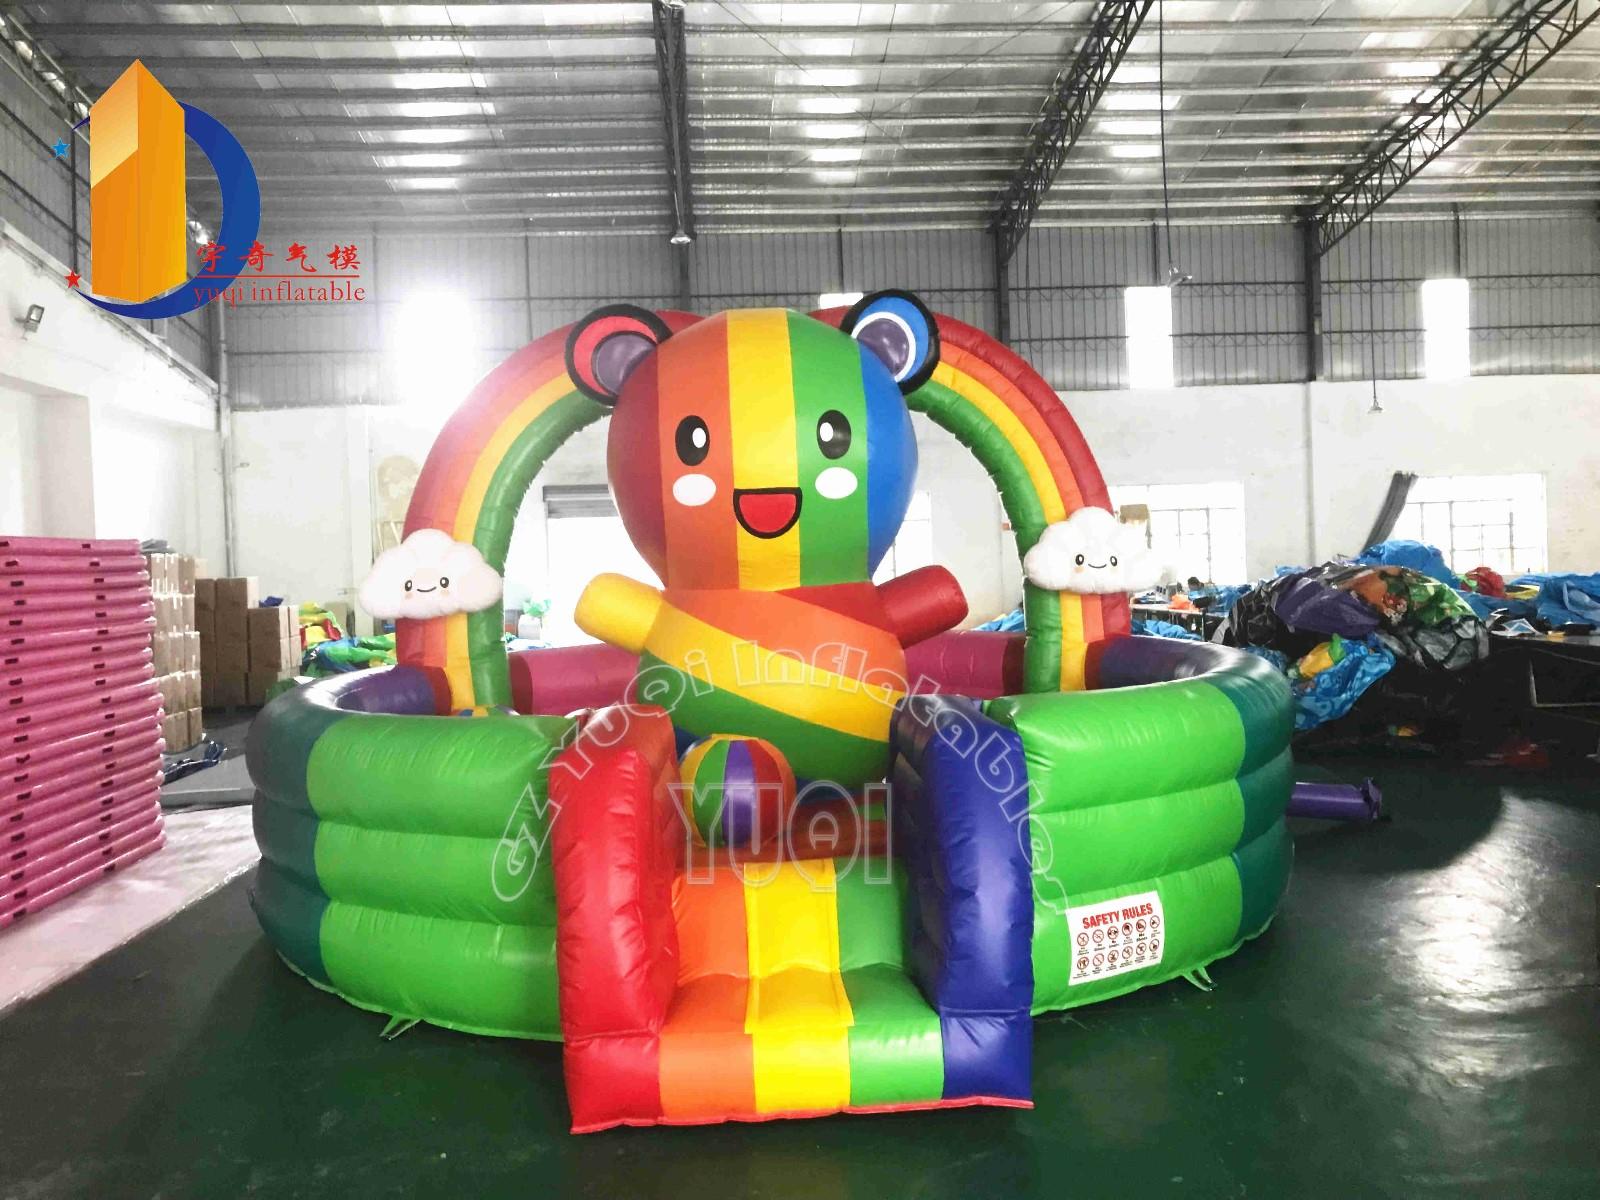 YUQI-Read YUQI Rainbow bear Inflatable bouncer News On Yuqi Inflatables